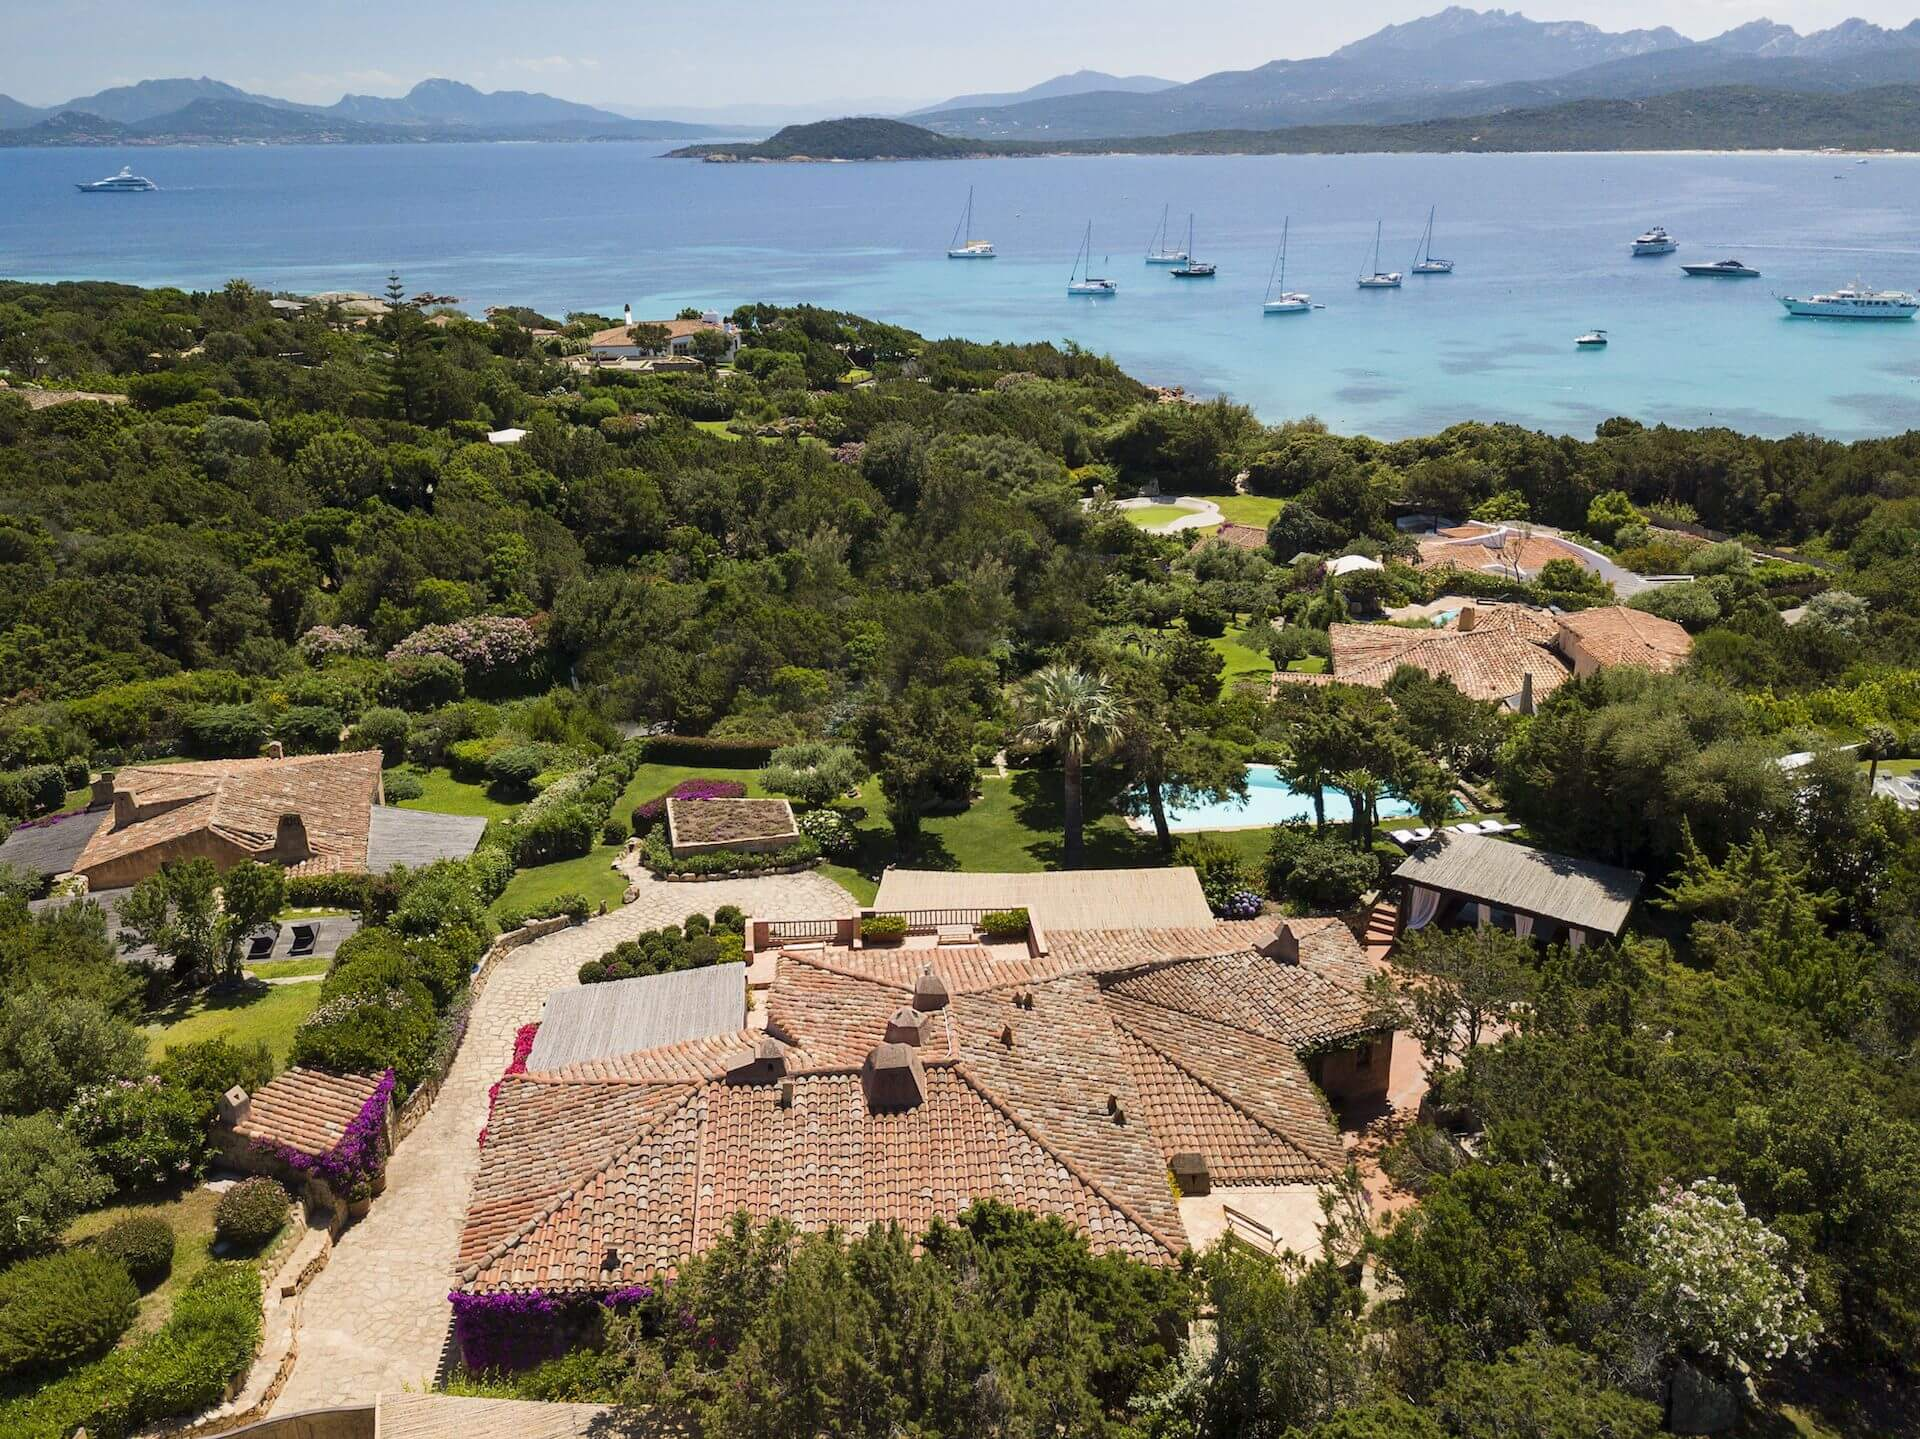 Coastal Accommodations Italy with Class